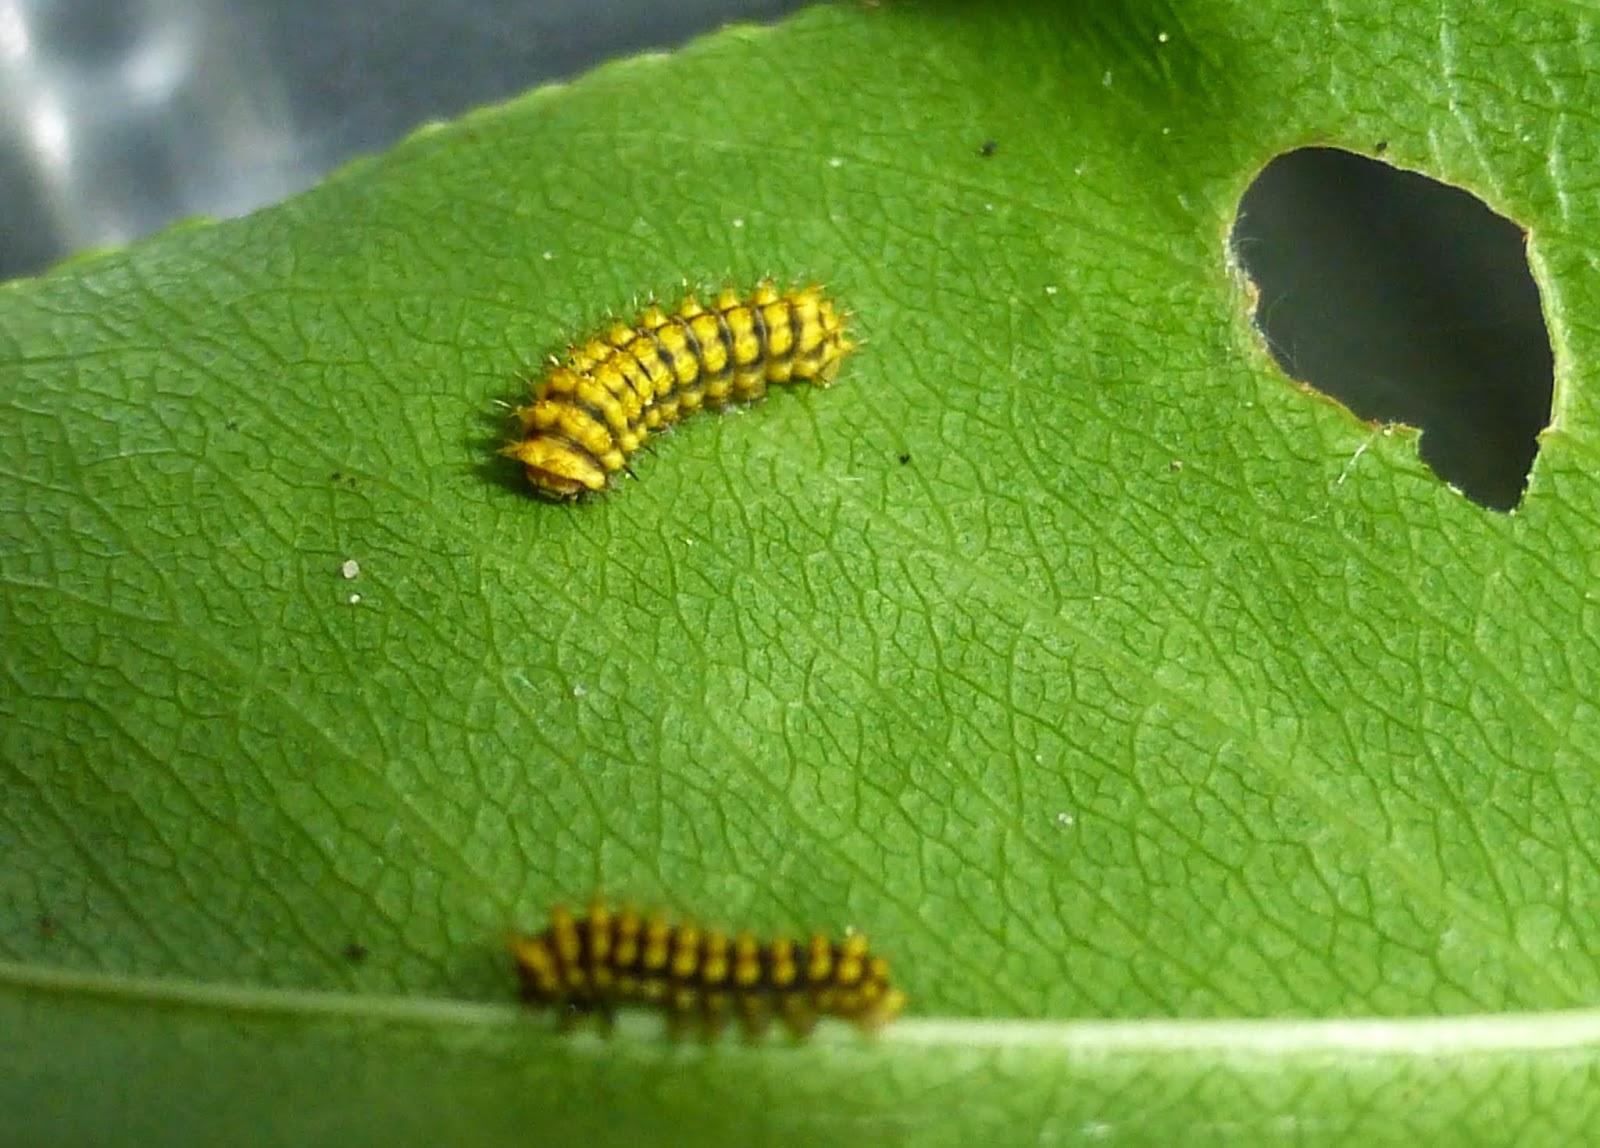 Rothschildia lebeau forbesi L1 caterpillars